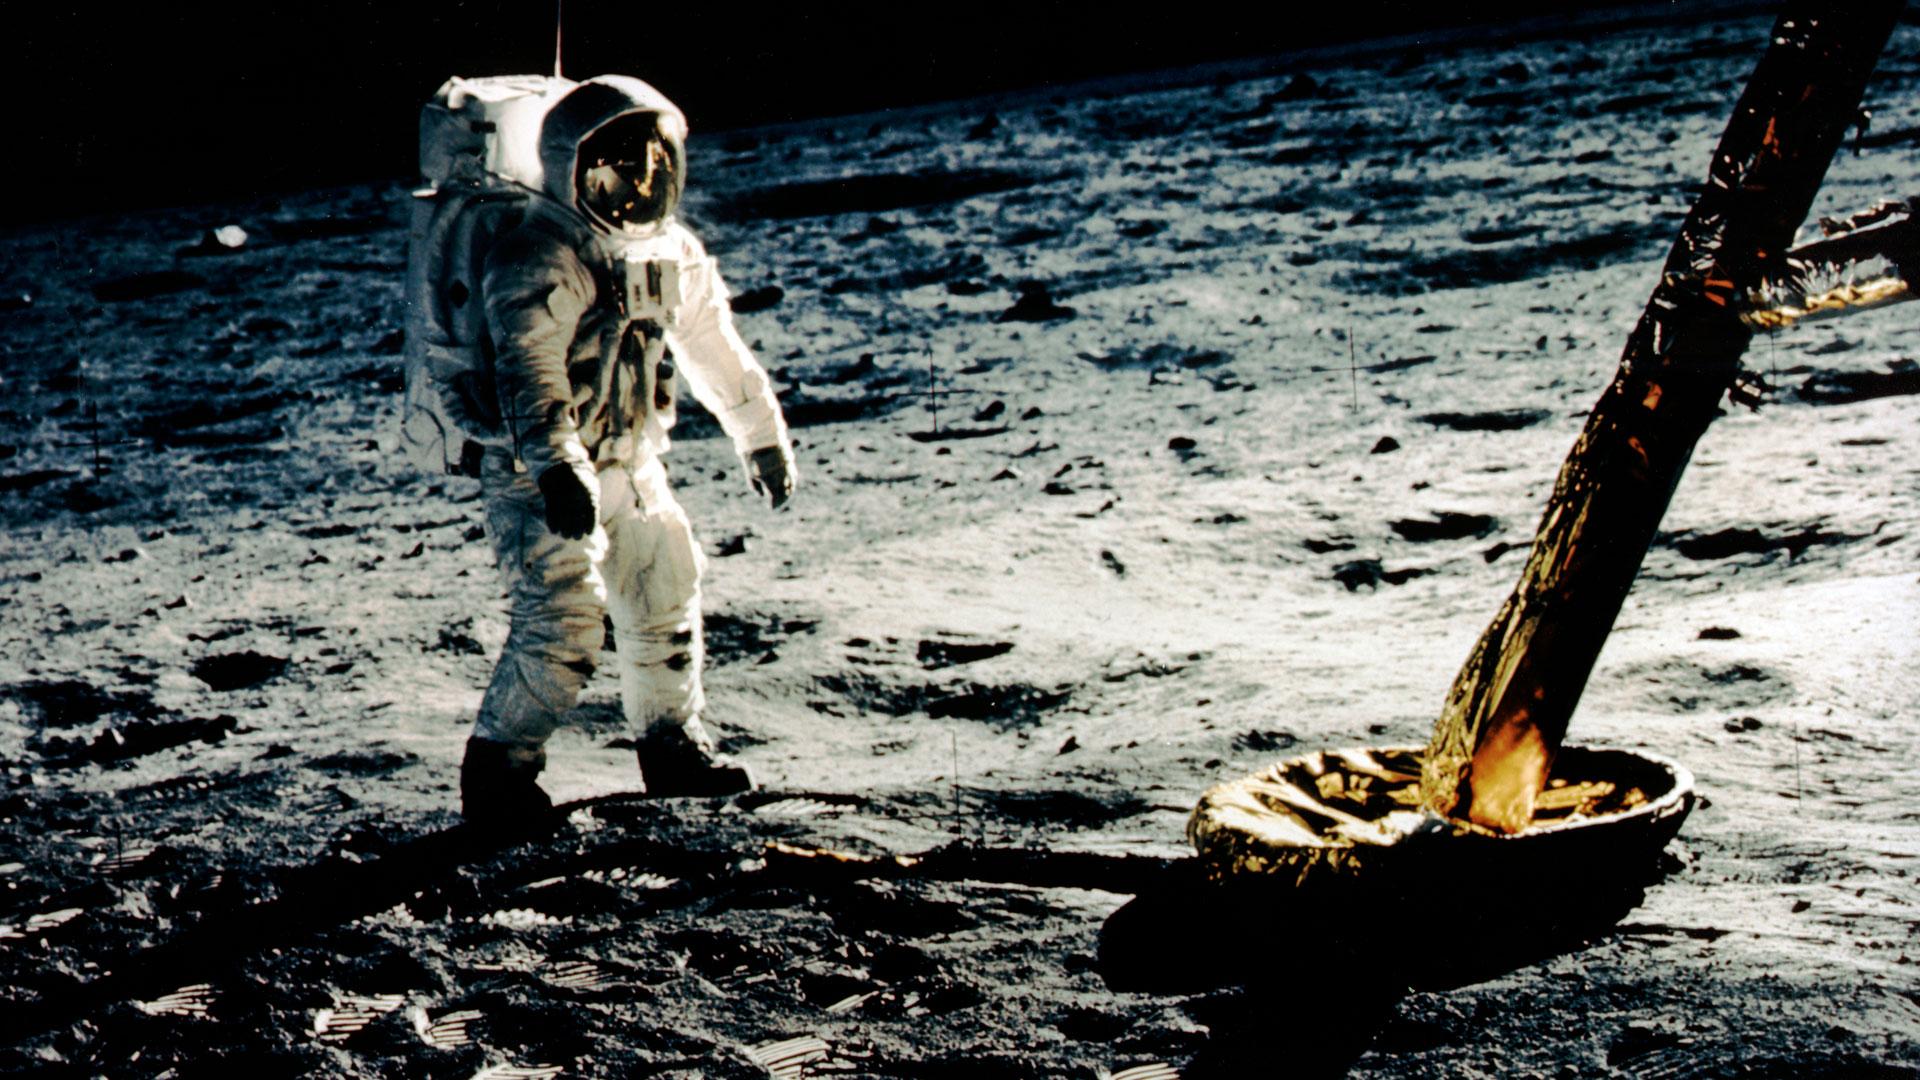 Un hombre en la Luna hero asset